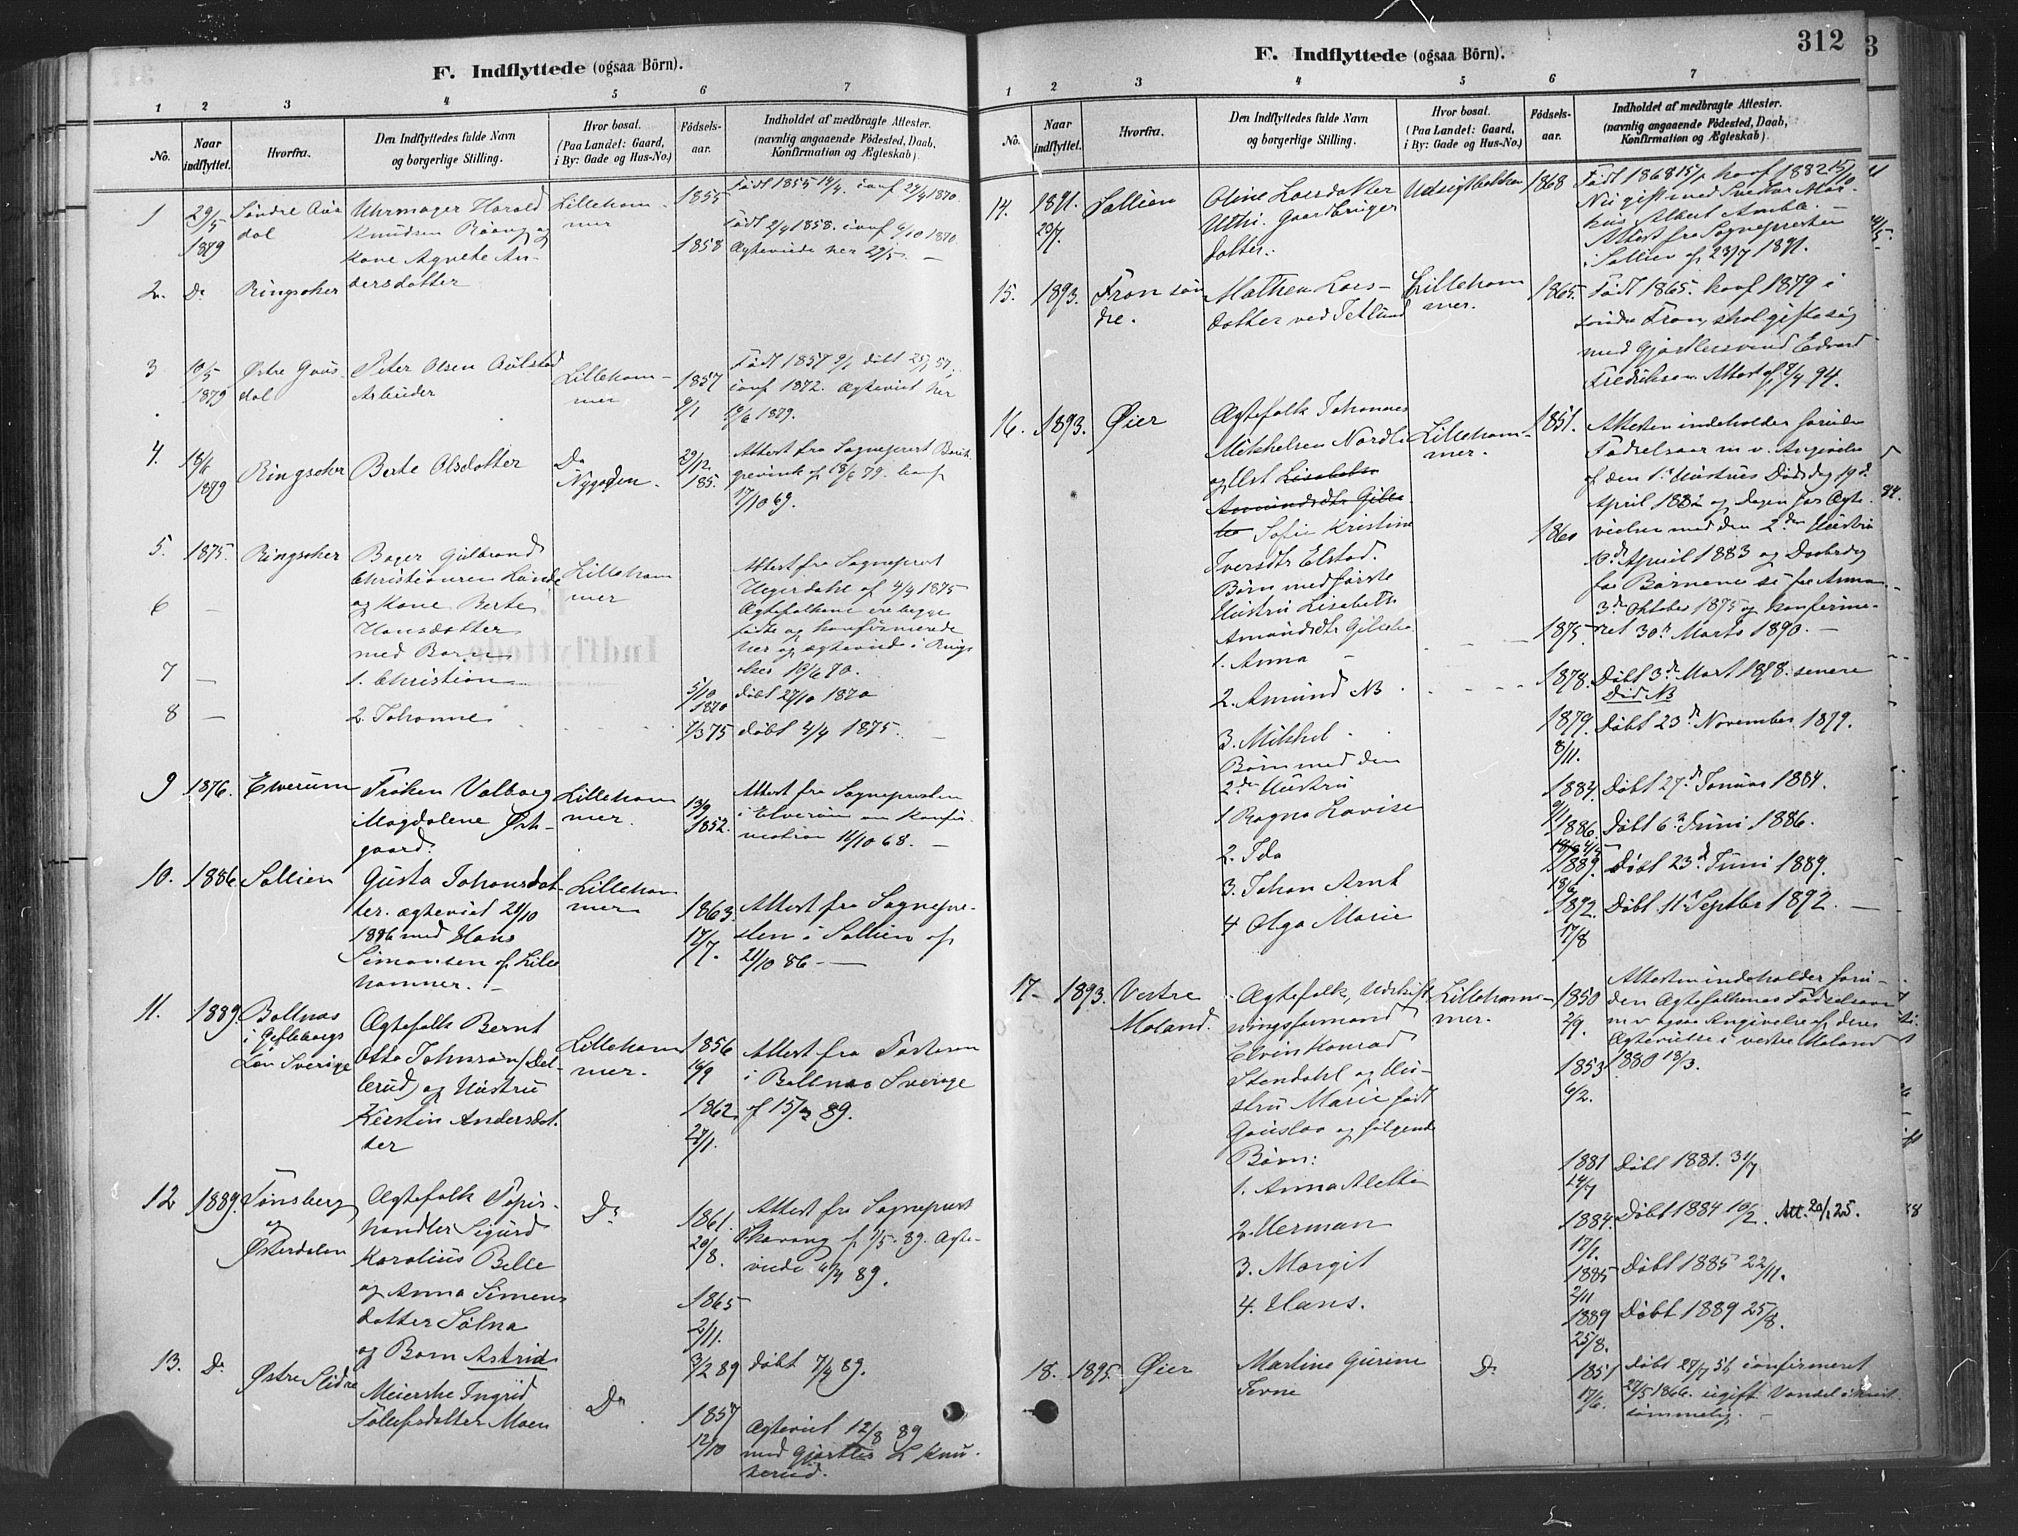 SAH, Fåberg prestekontor, H/Ha/Haa/L0010: Ministerialbok nr. 10, 1879-1900, s. 312